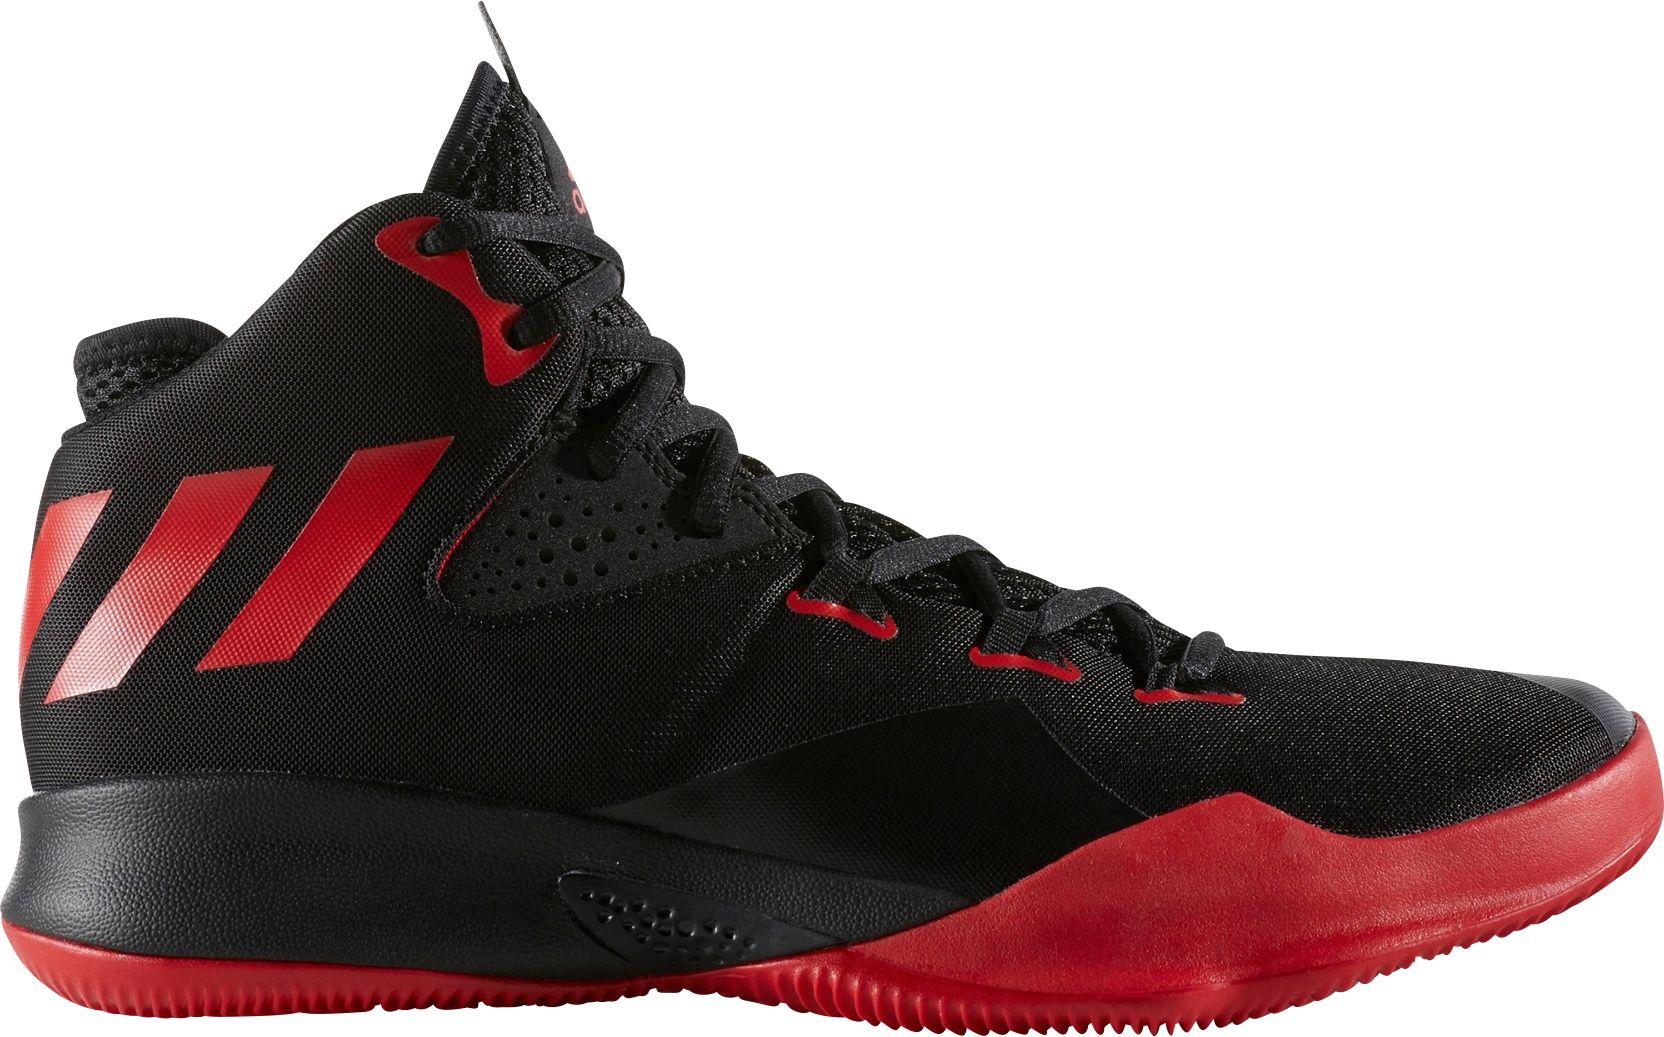 Mens Dual Threat 2017 Basketball Shoes adidas BnMNUfH